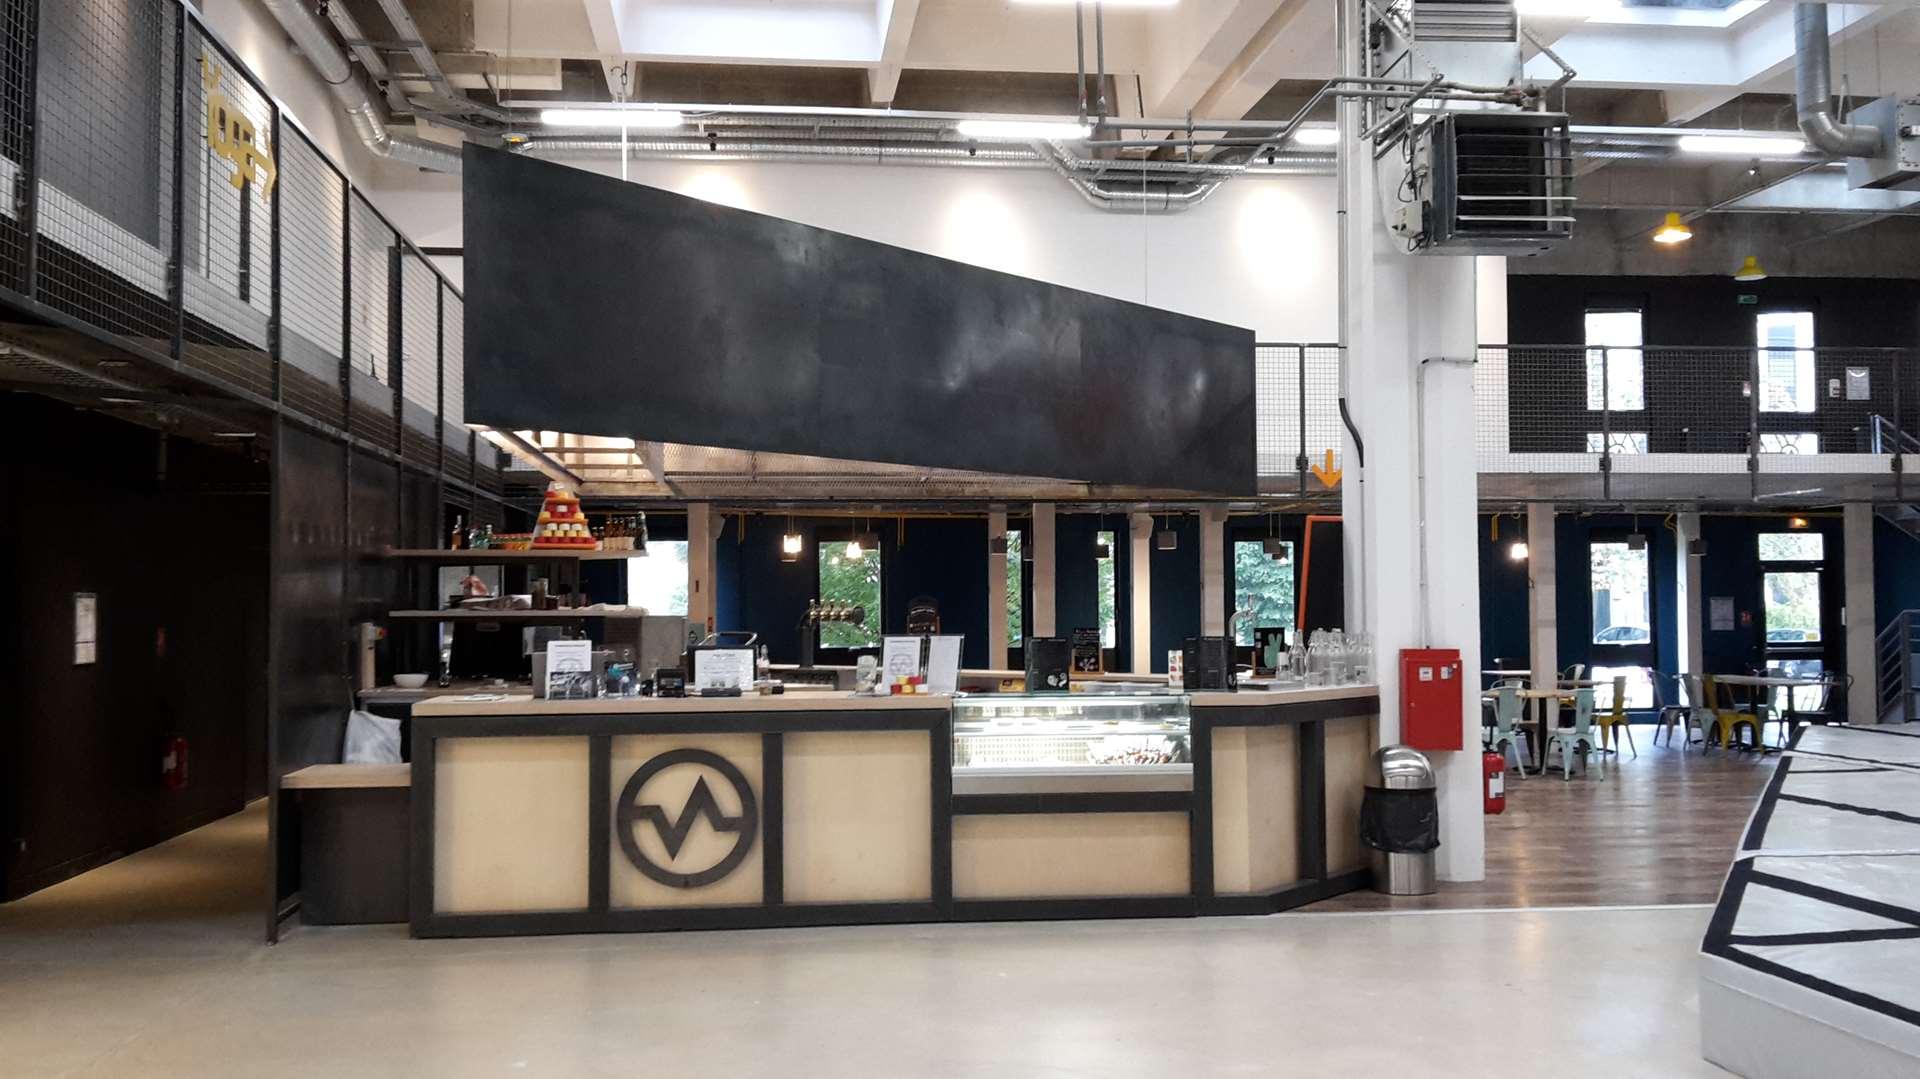 L'accueil Vertical'Art Rungis - salle d'escalade de bloc indoor France